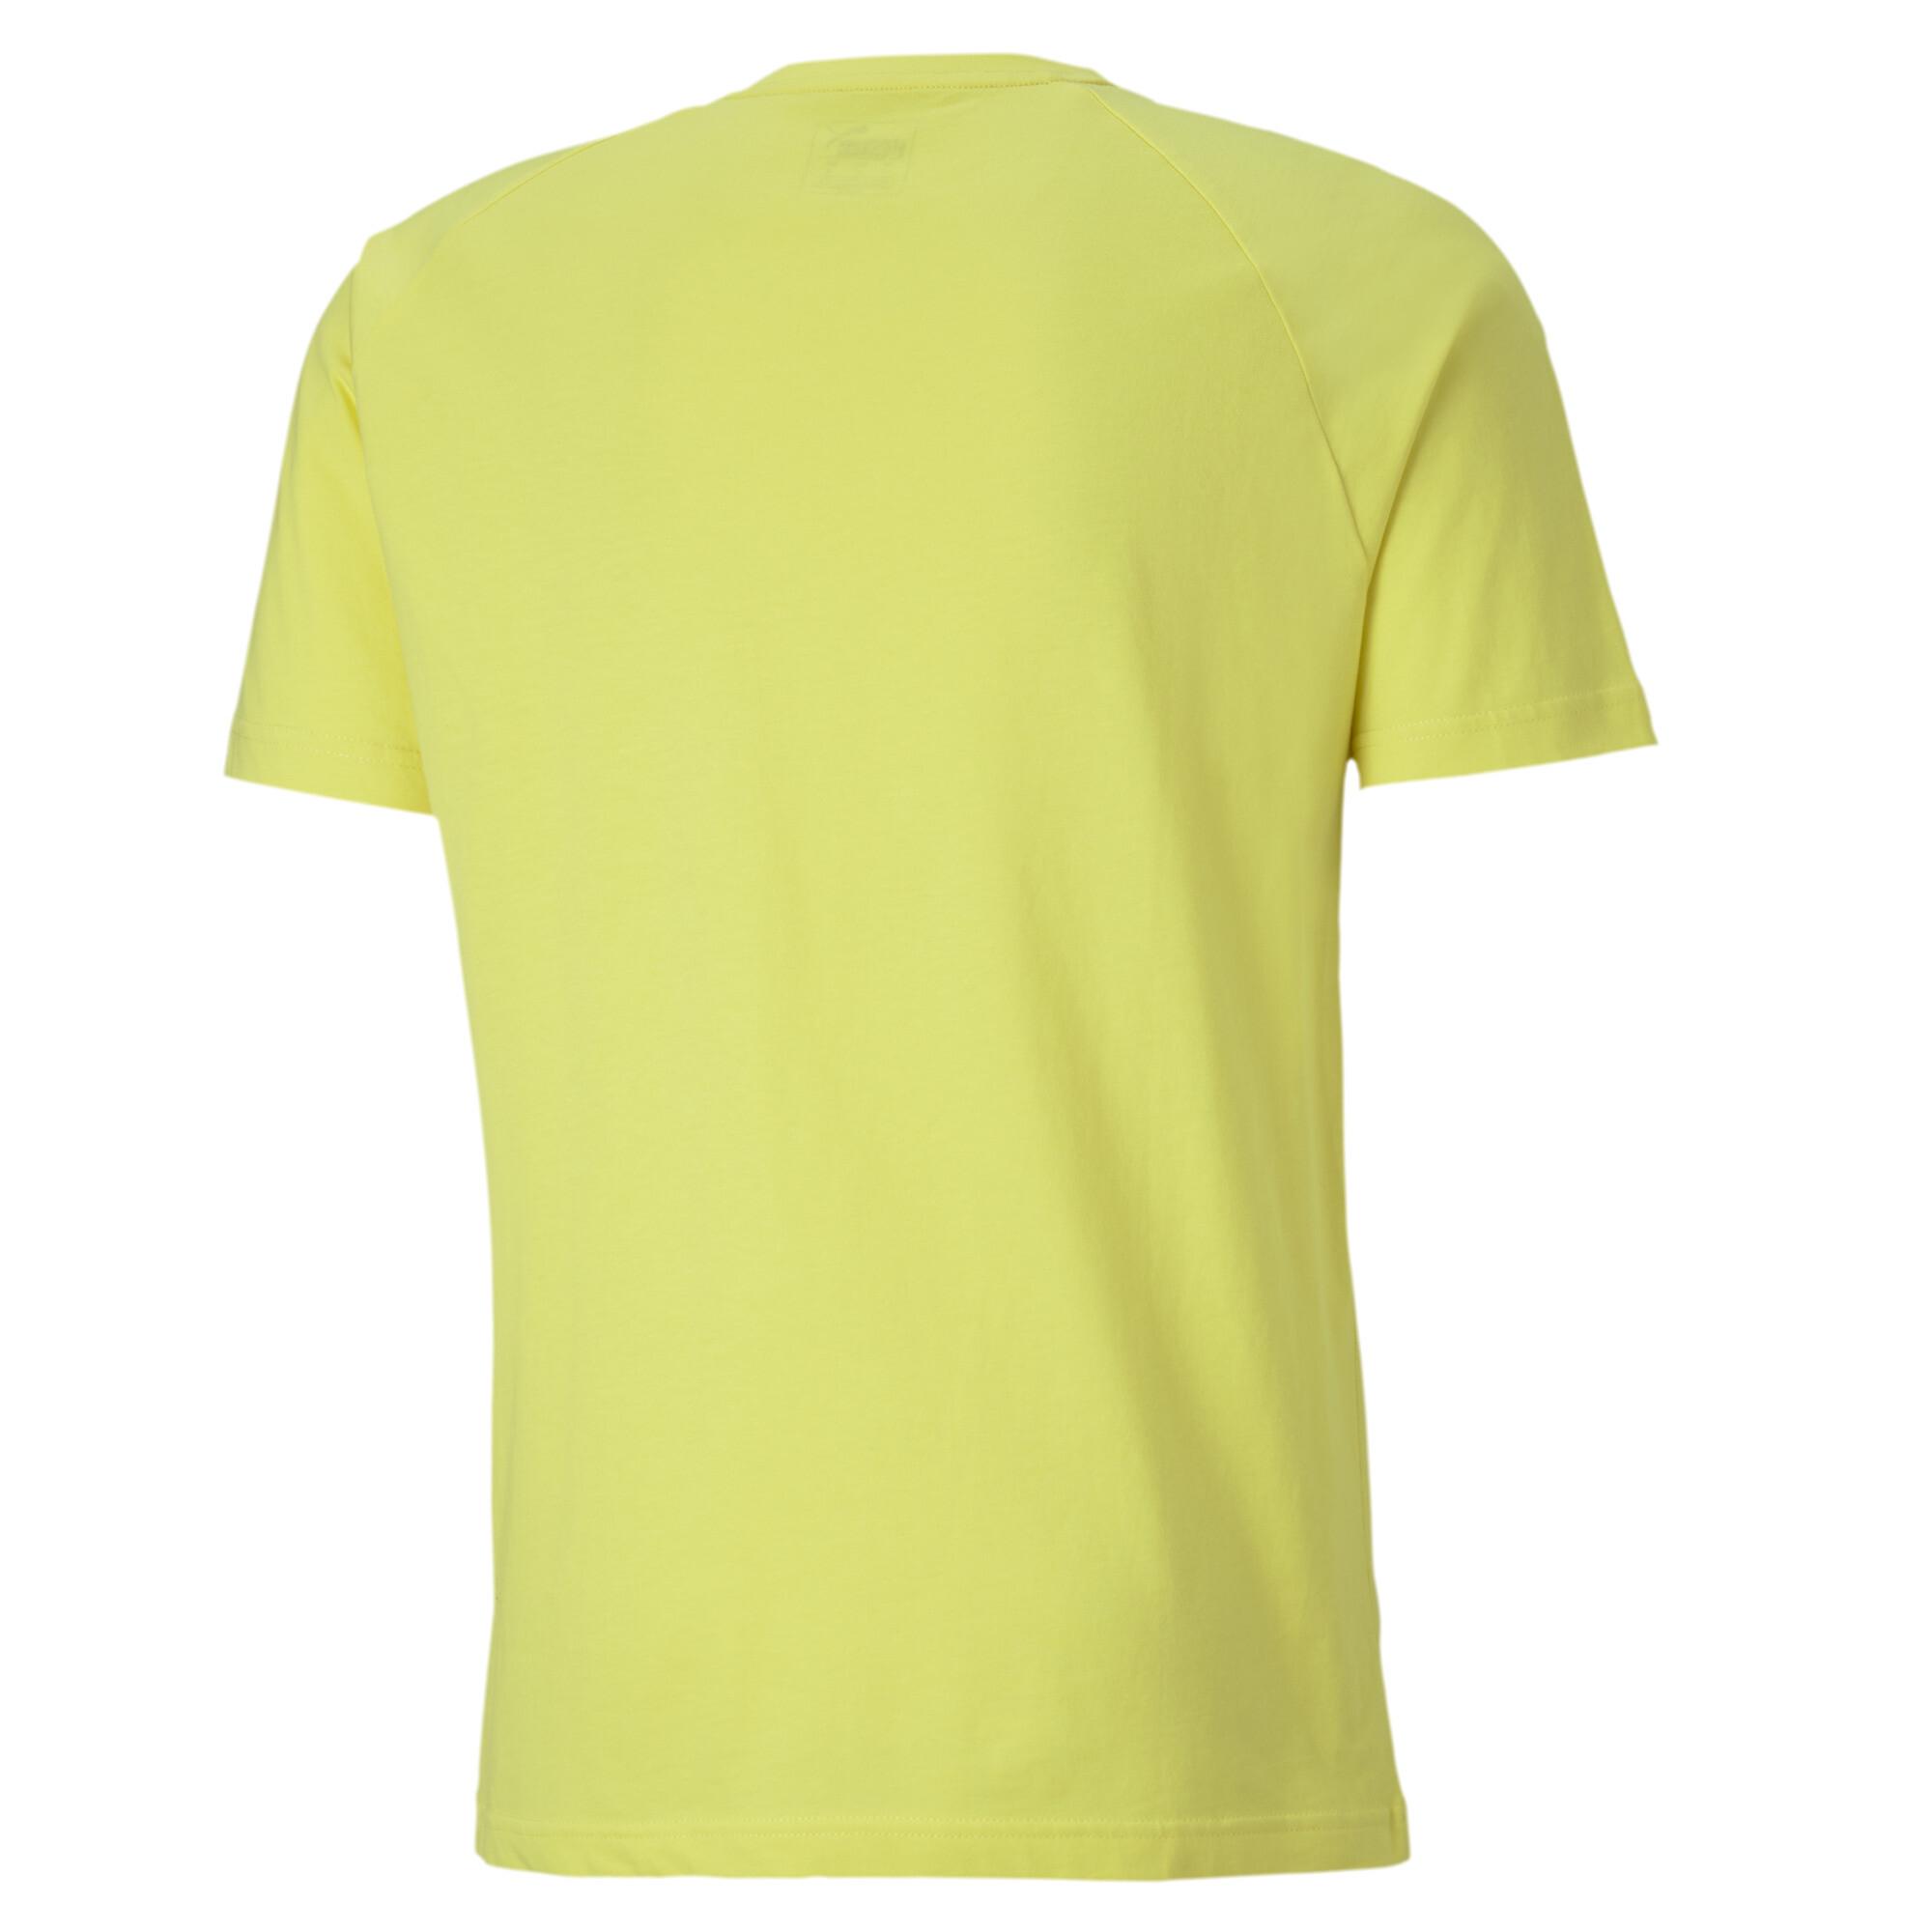 PUMA-Modern-Sports-Men-039-s-Logo-Tee-Men-Tee-Basics thumbnail 18